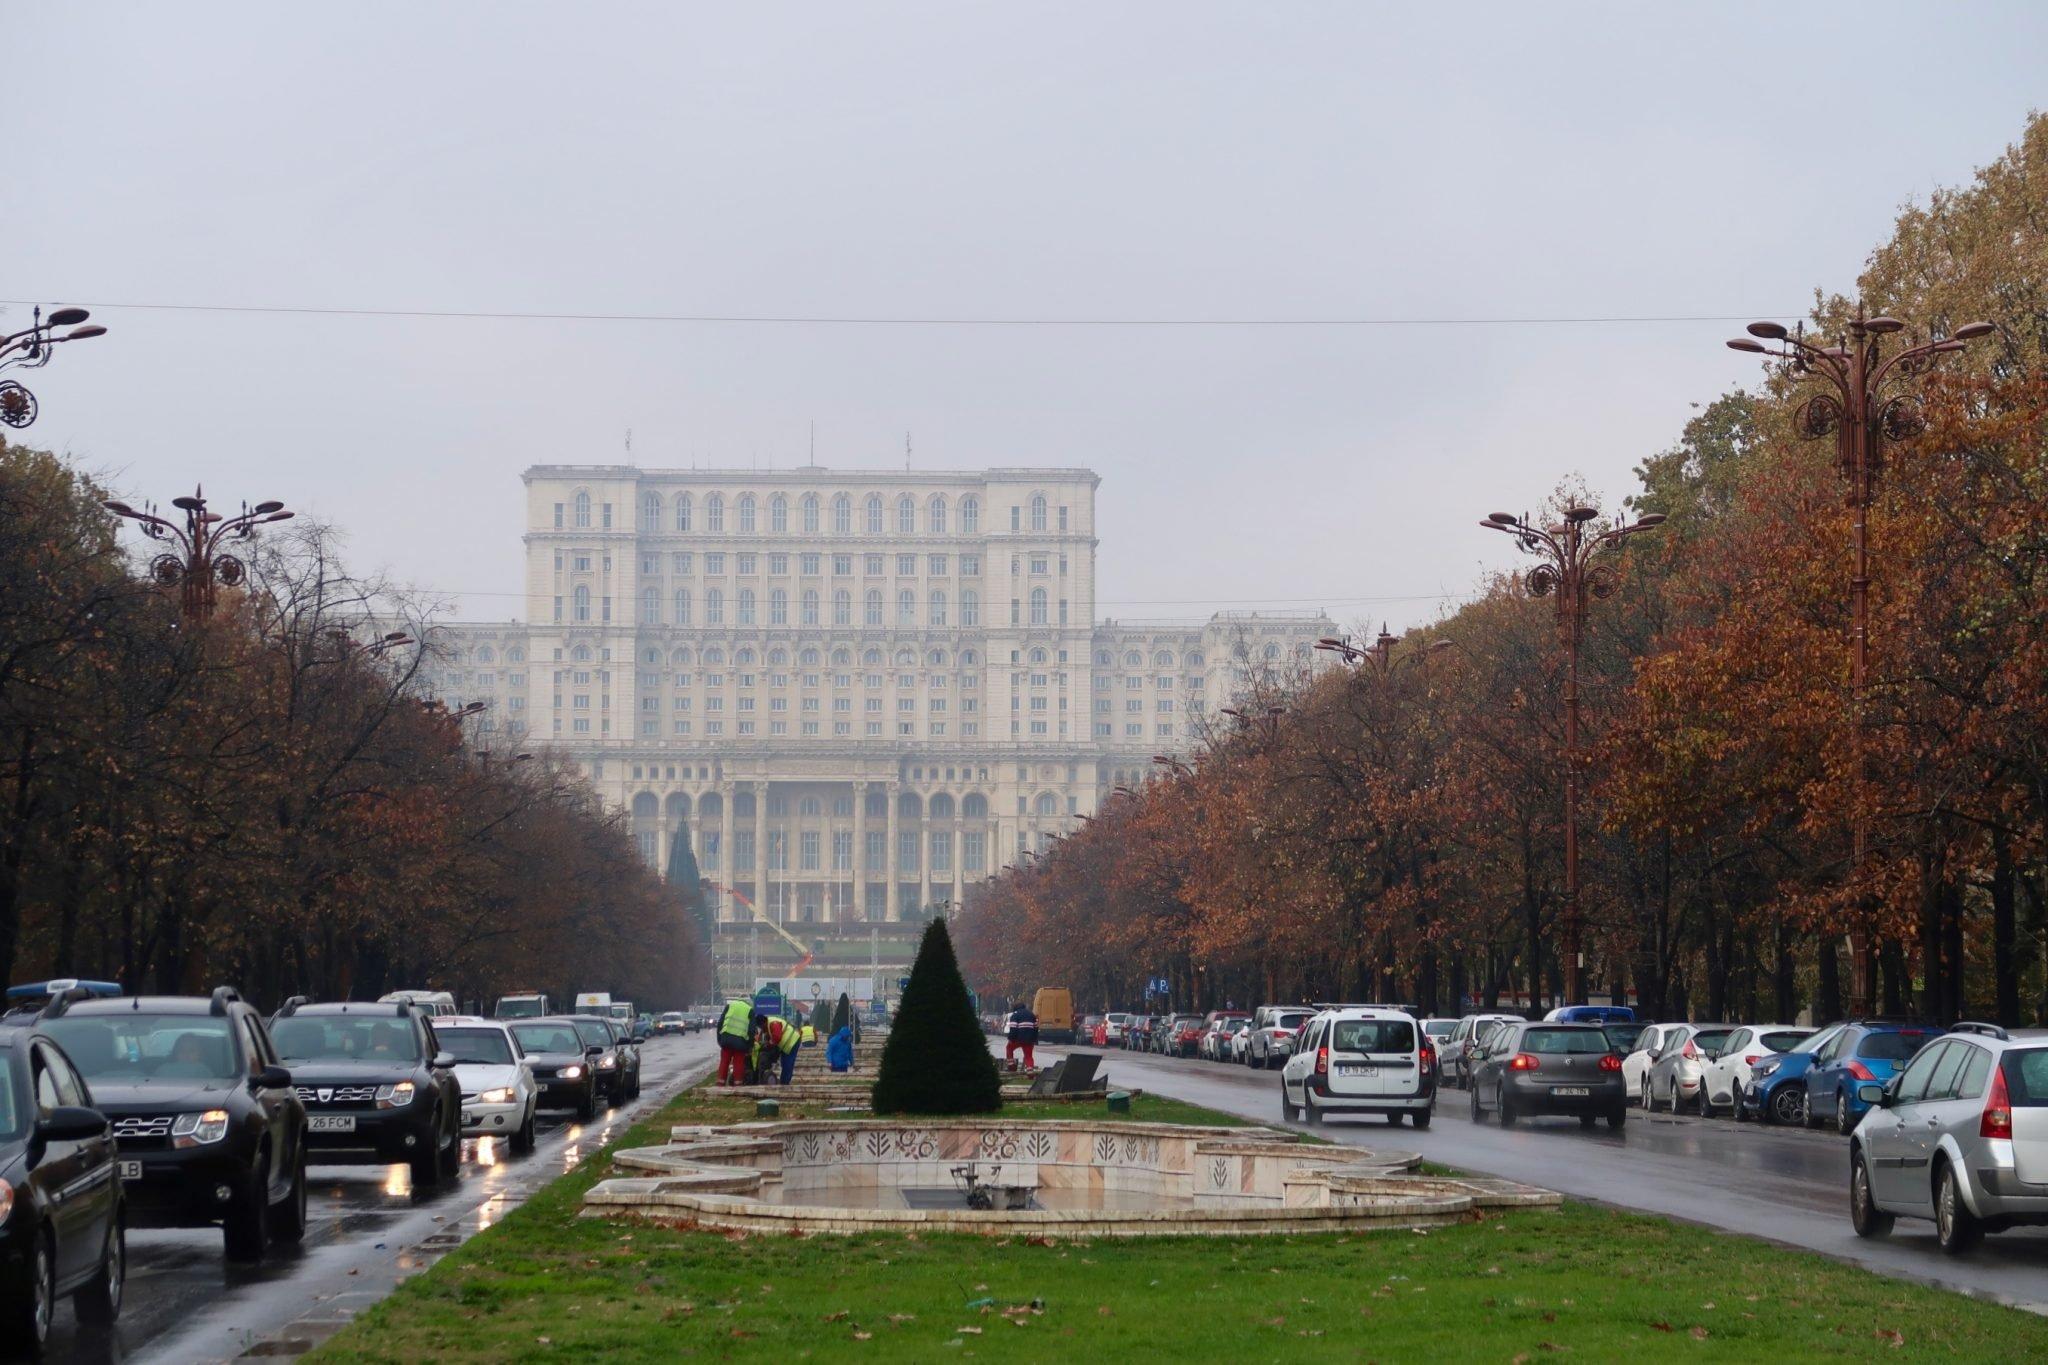 Bukarestin parlamenttitalo